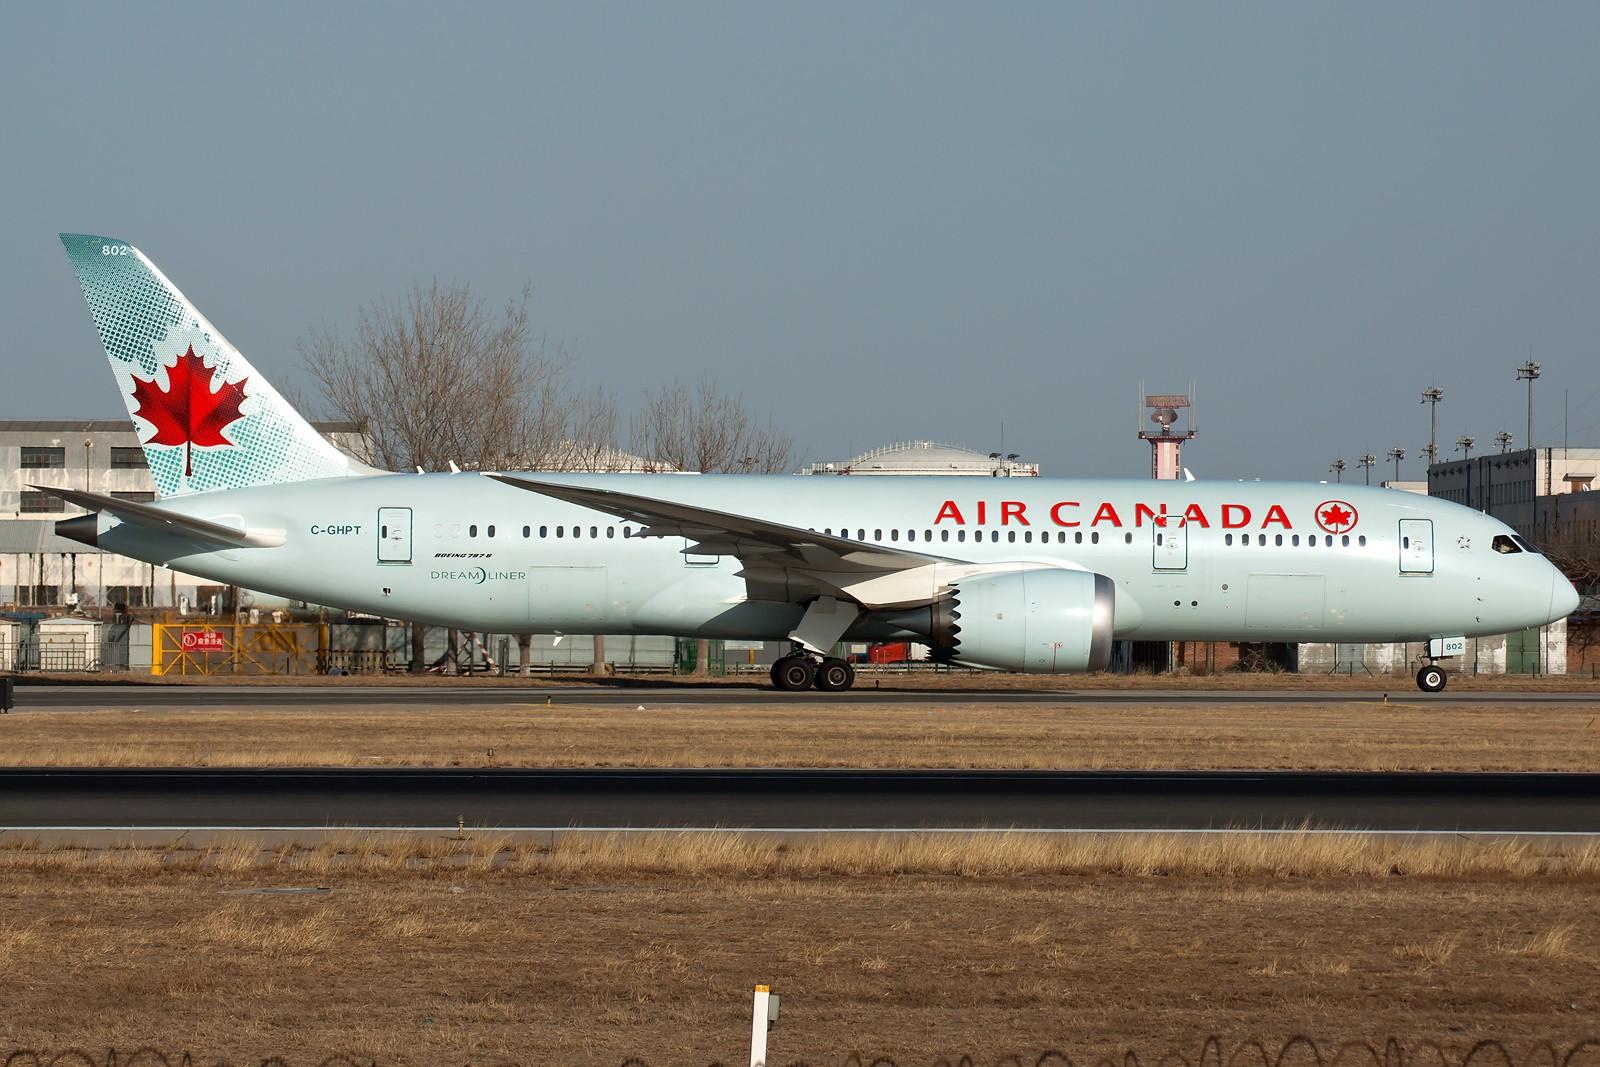 [一图党] 加拿大航空 C-GHPT B787-8 Dreamliner BOEING B787-8 DREAMLINER C-GHPT 中国北京首都国际机场